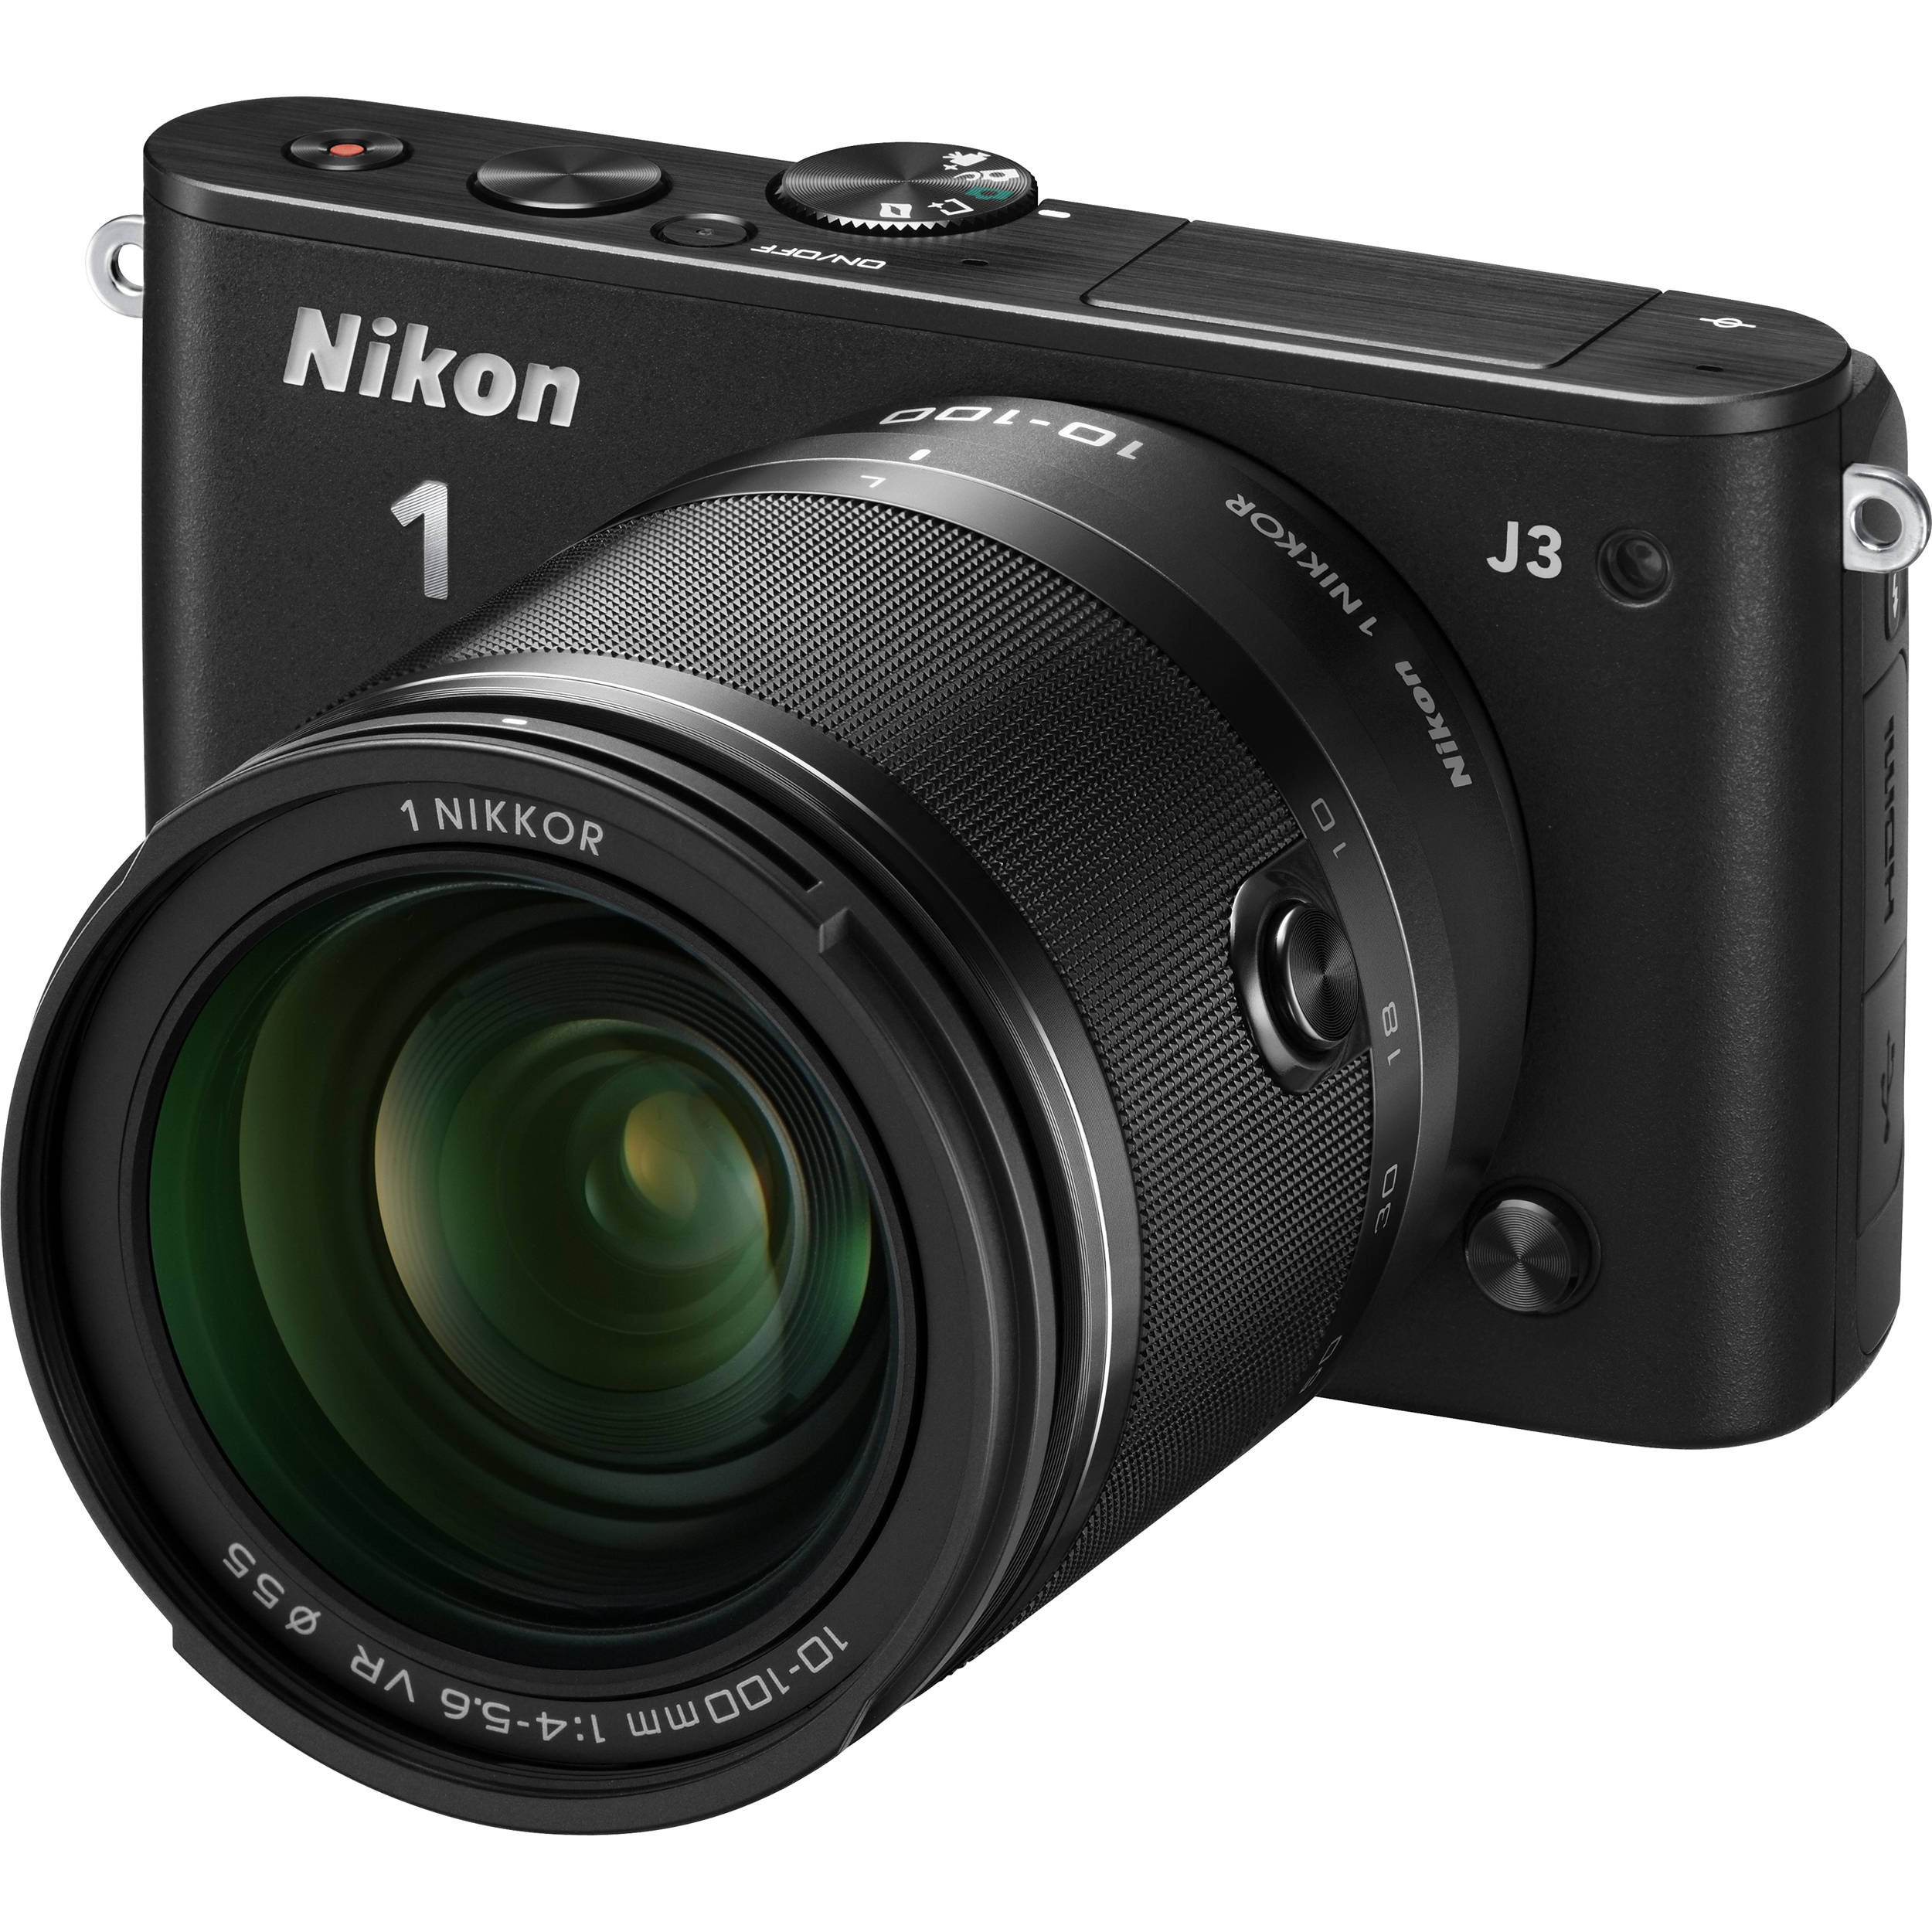 Nikon 1 J3 14.2MP Digital Camera - White (Kit w/ VR 10 ...